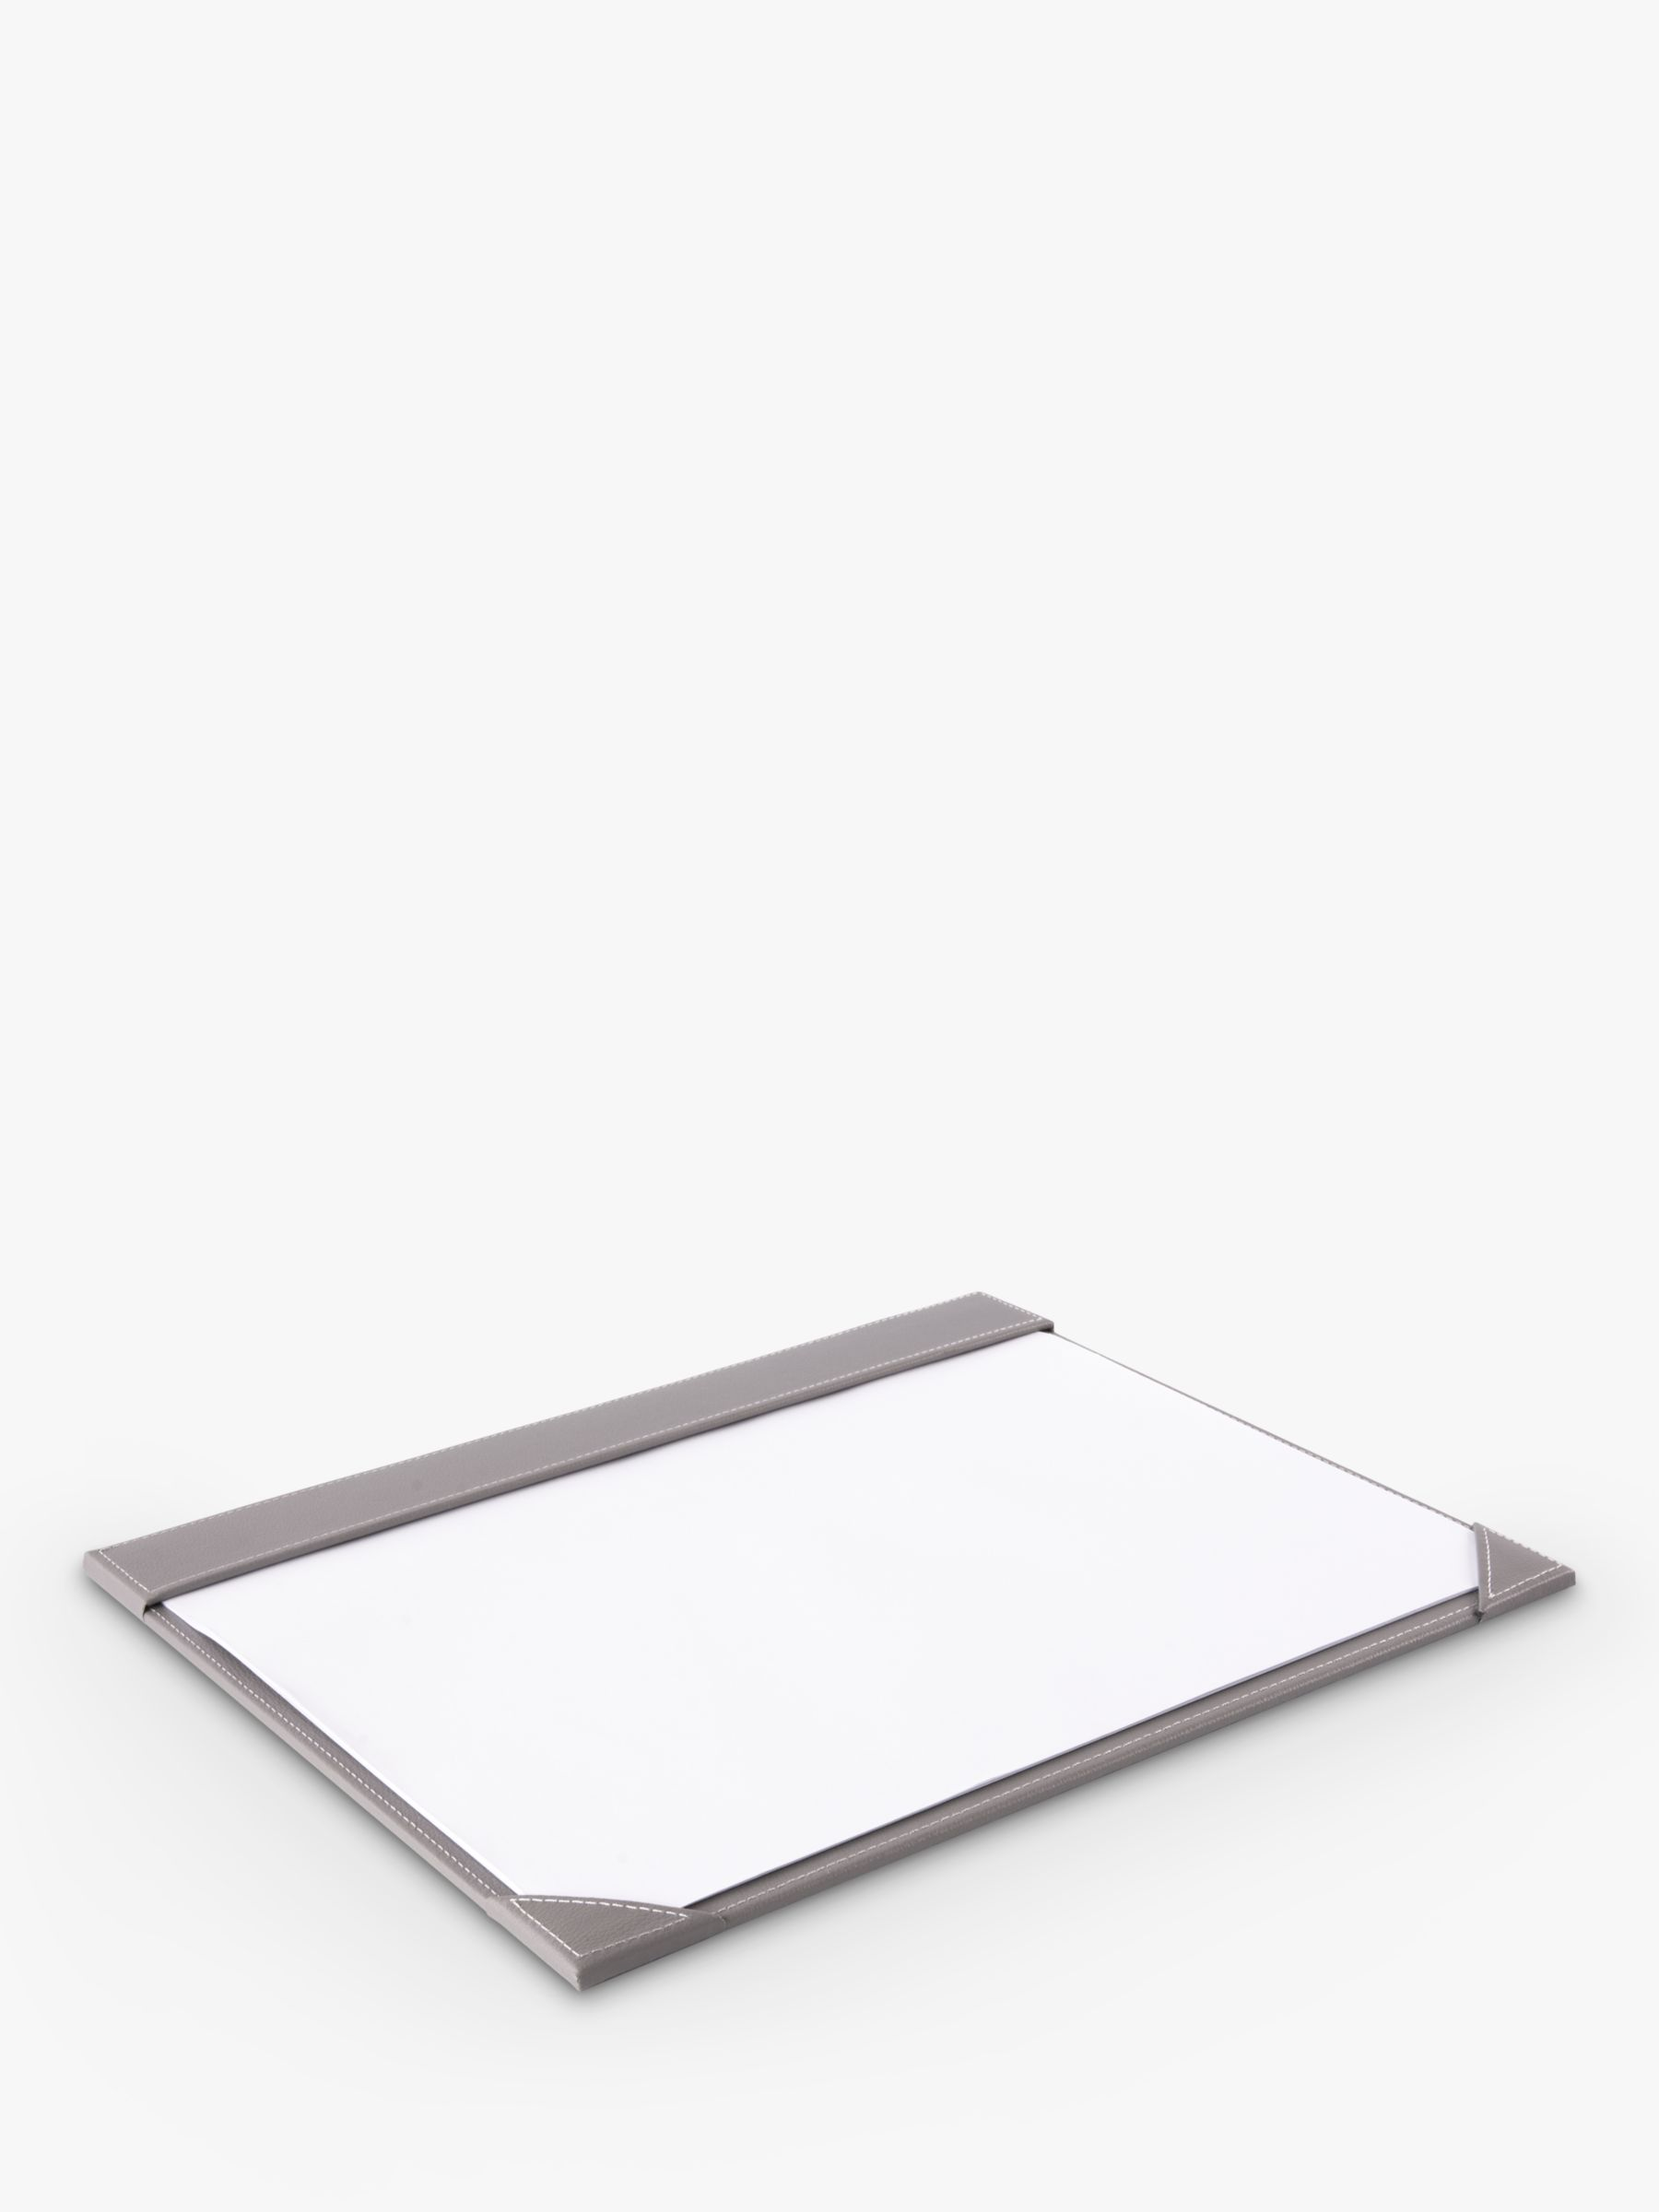 Osco Osco Faux Leather A3 Desk Mat Notepad